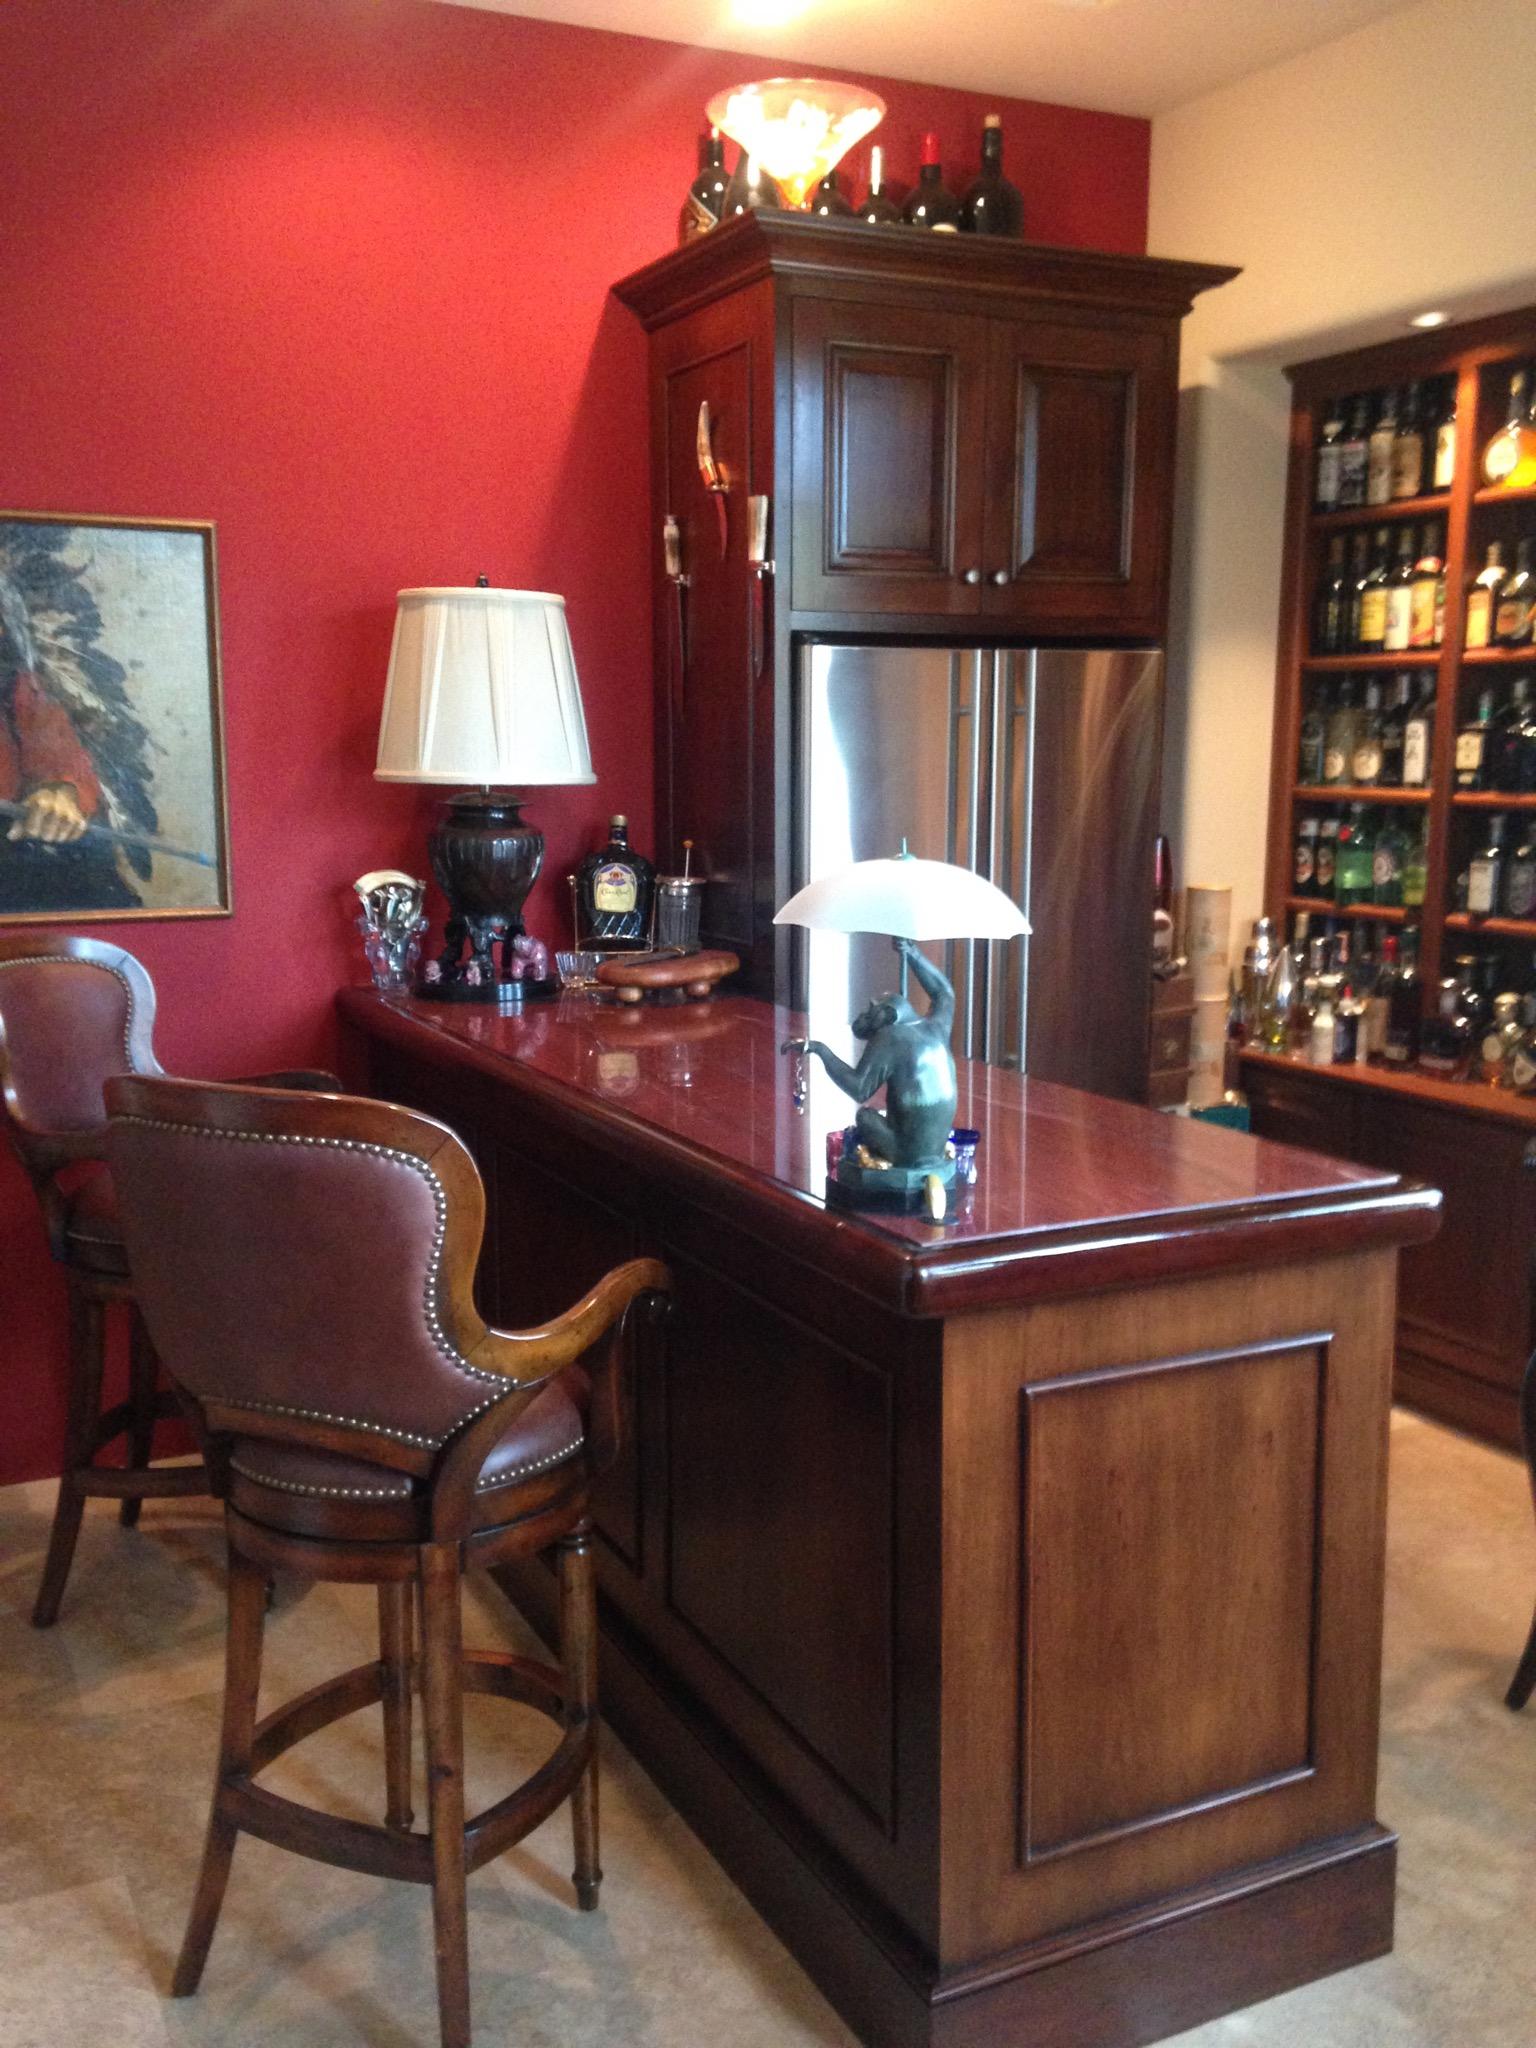 Man Cave, man cave bar, custom bar, residential bar, old style bar, rich woodwork,